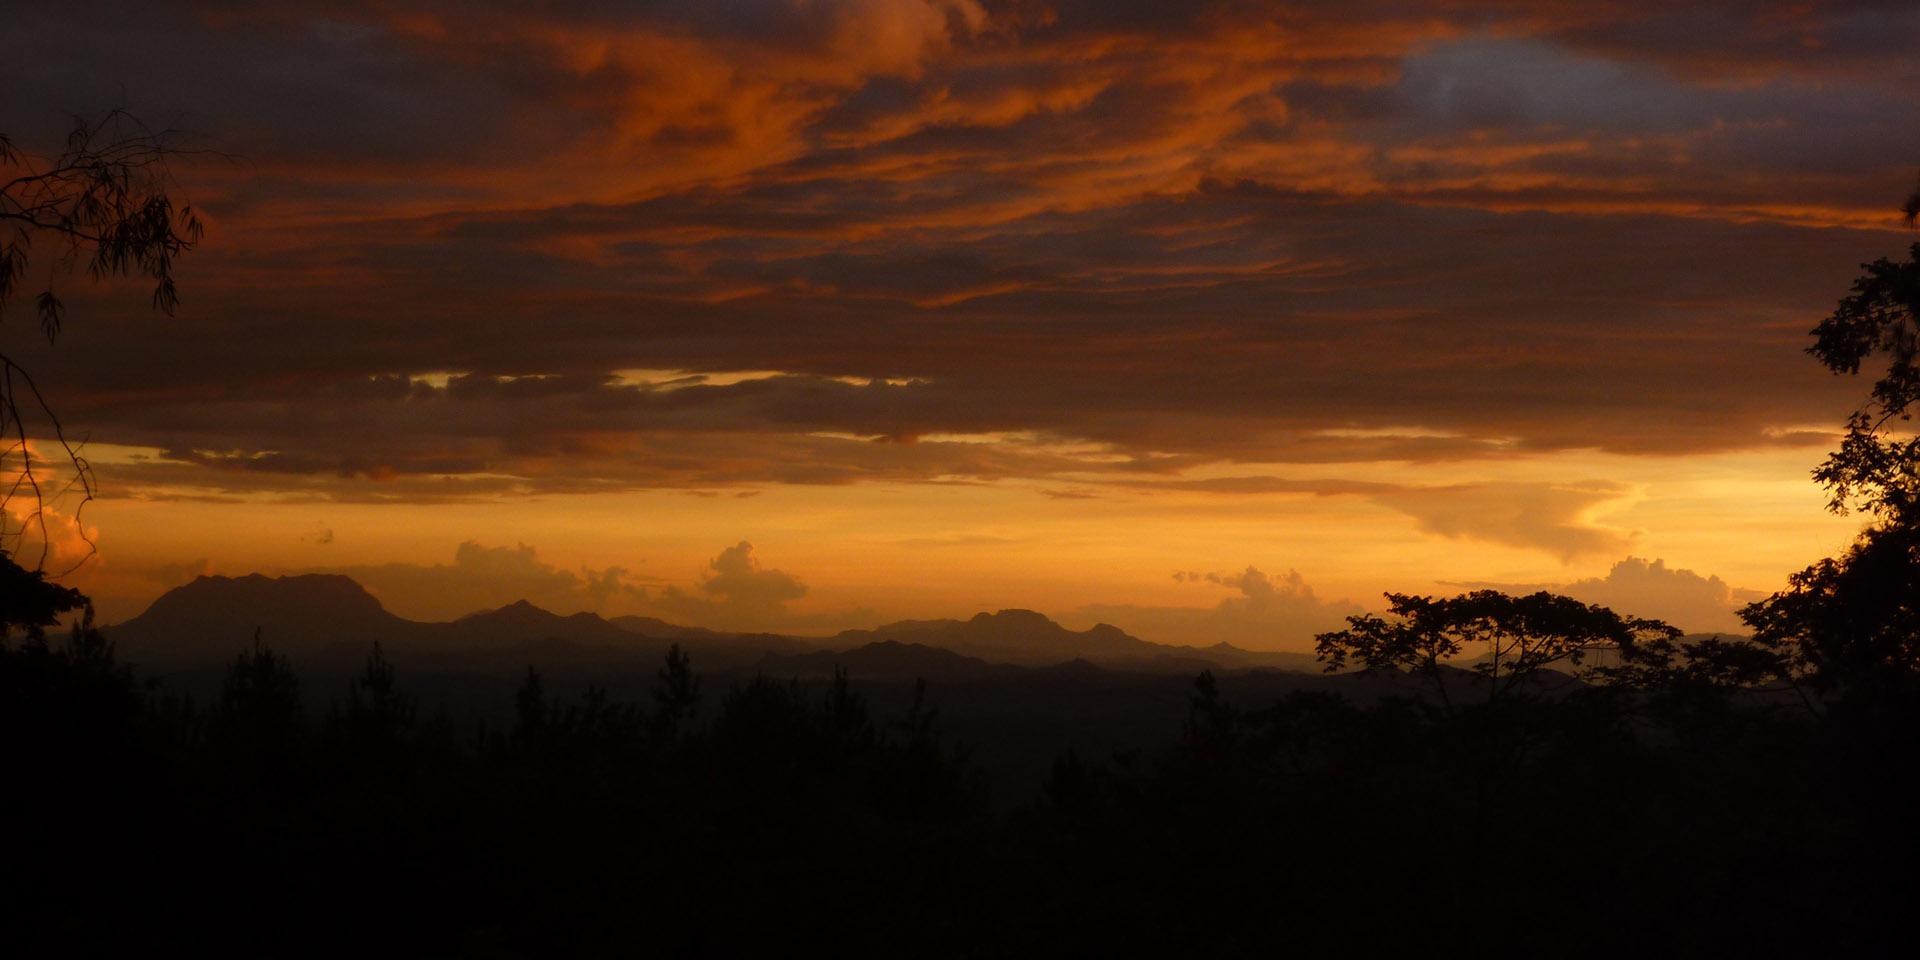 zomba plateau summit-hike-malawian-style-malawi-adventures-experiences-specialist-tour-operator-landscape-scenic